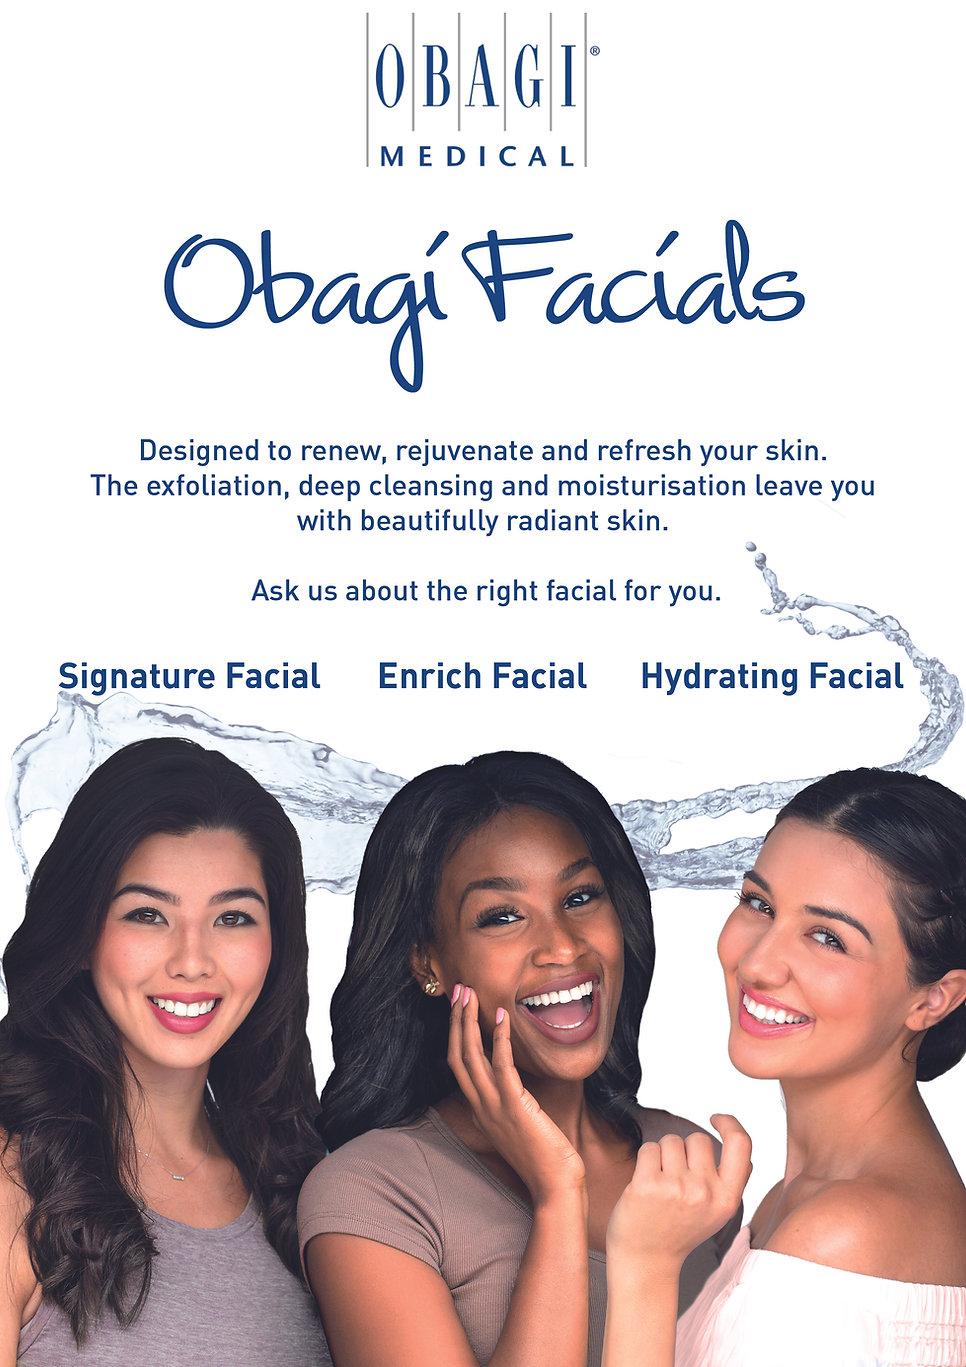 Obagi Facial Kit Counter Card or Poster.